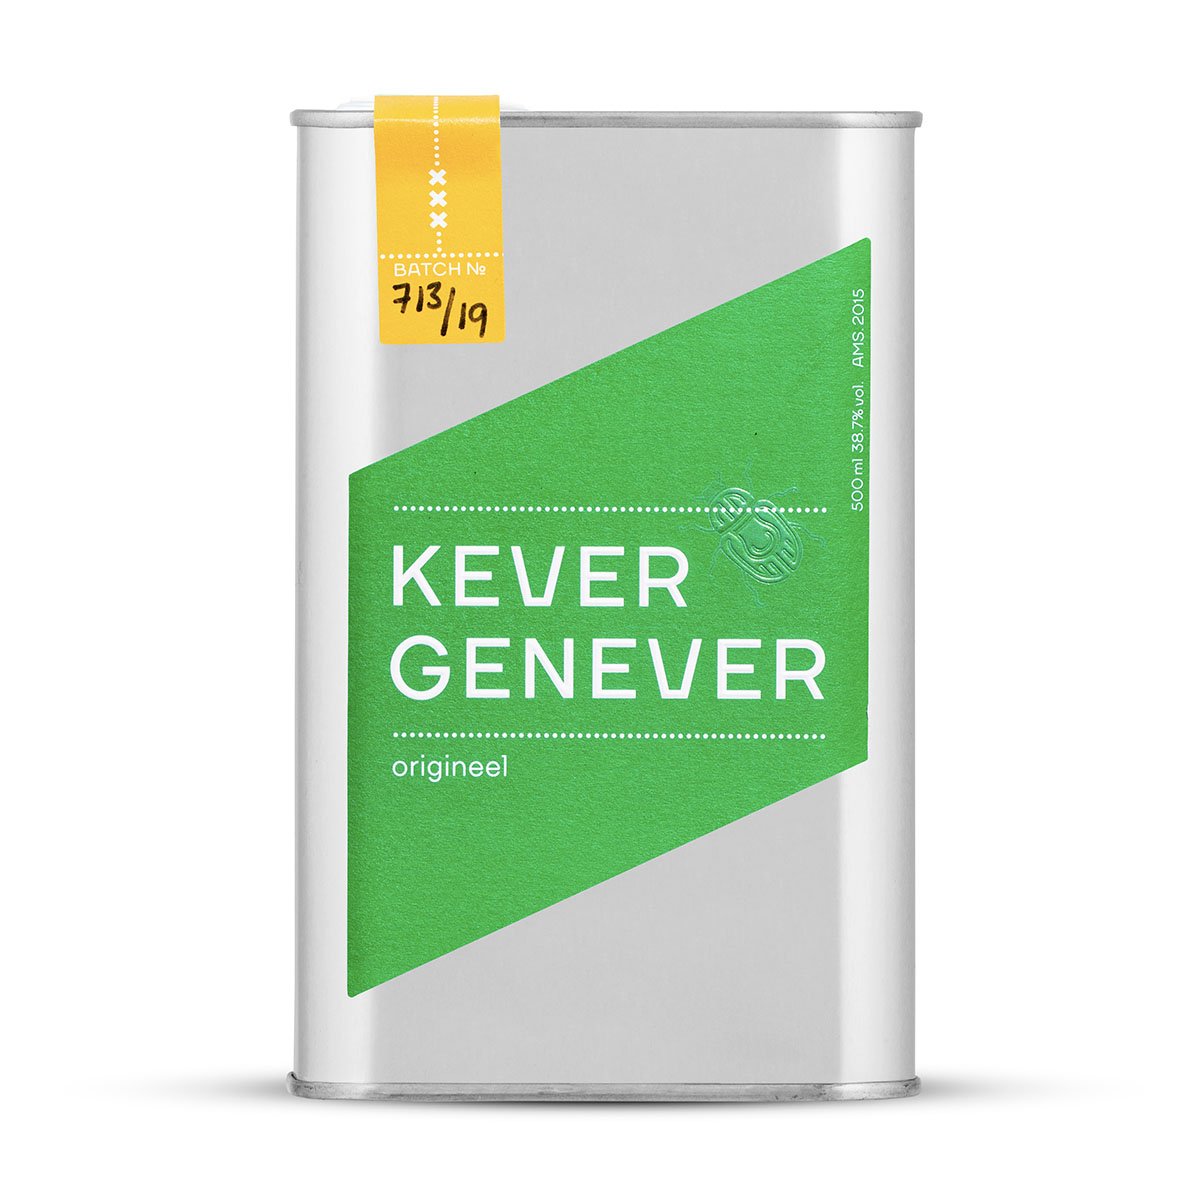 Kever Genever packshot